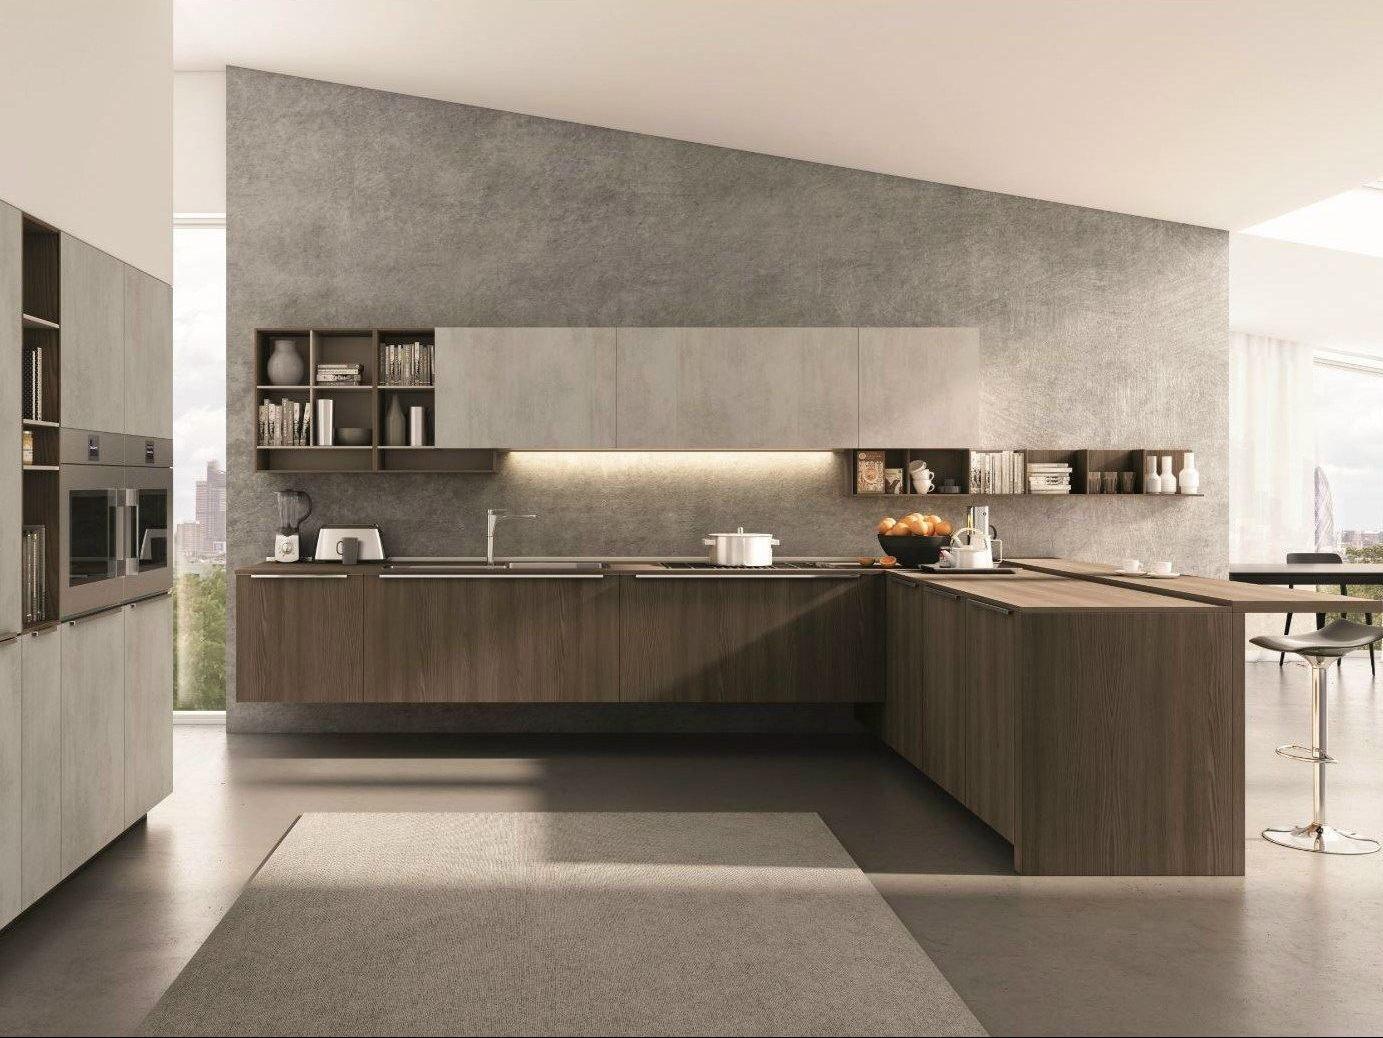 Cucina componibile con penisola FILOLAIN by Euromobil Kitchen